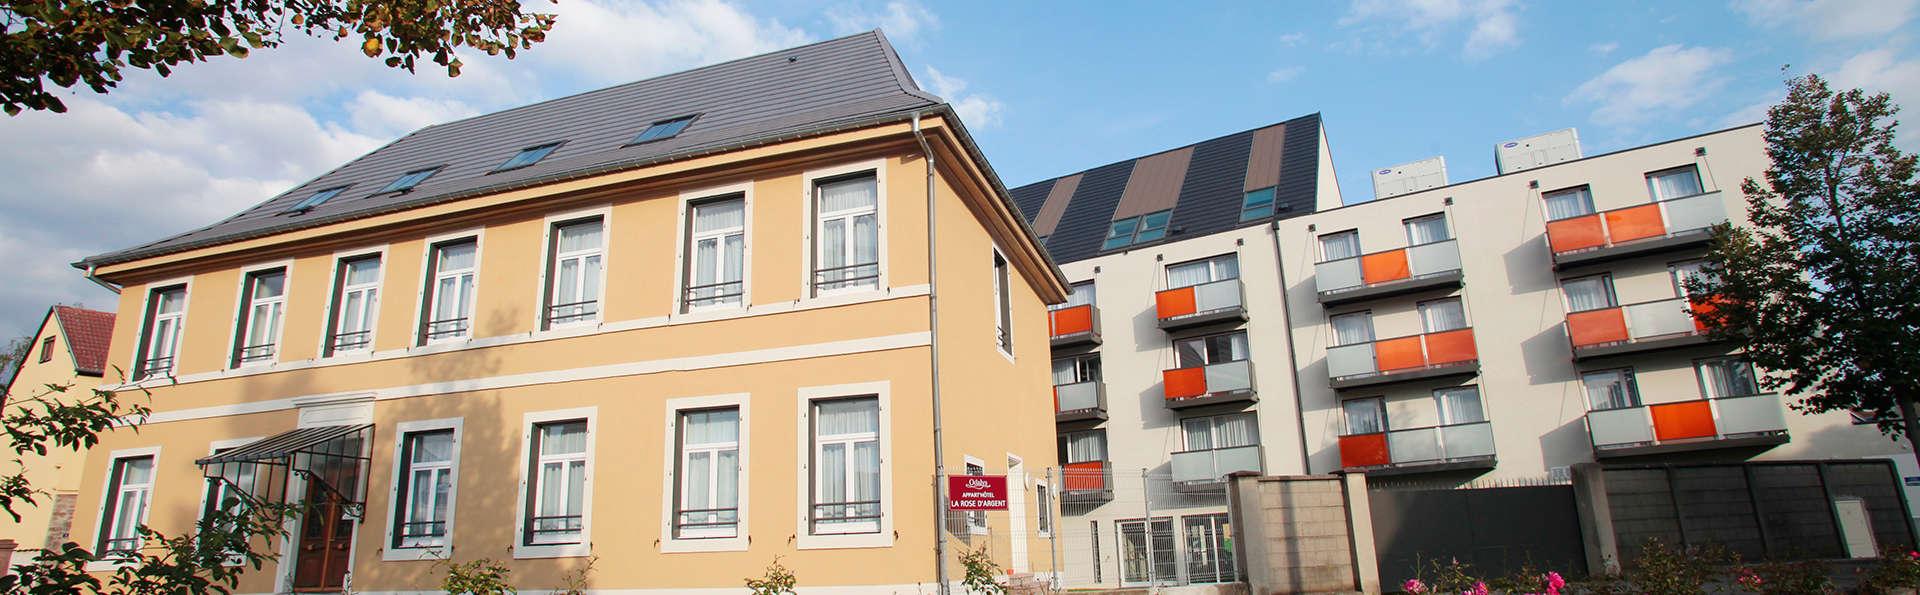 Appart'hôtel Odalys La Rose d'Argent - EDIT_front1.jpg